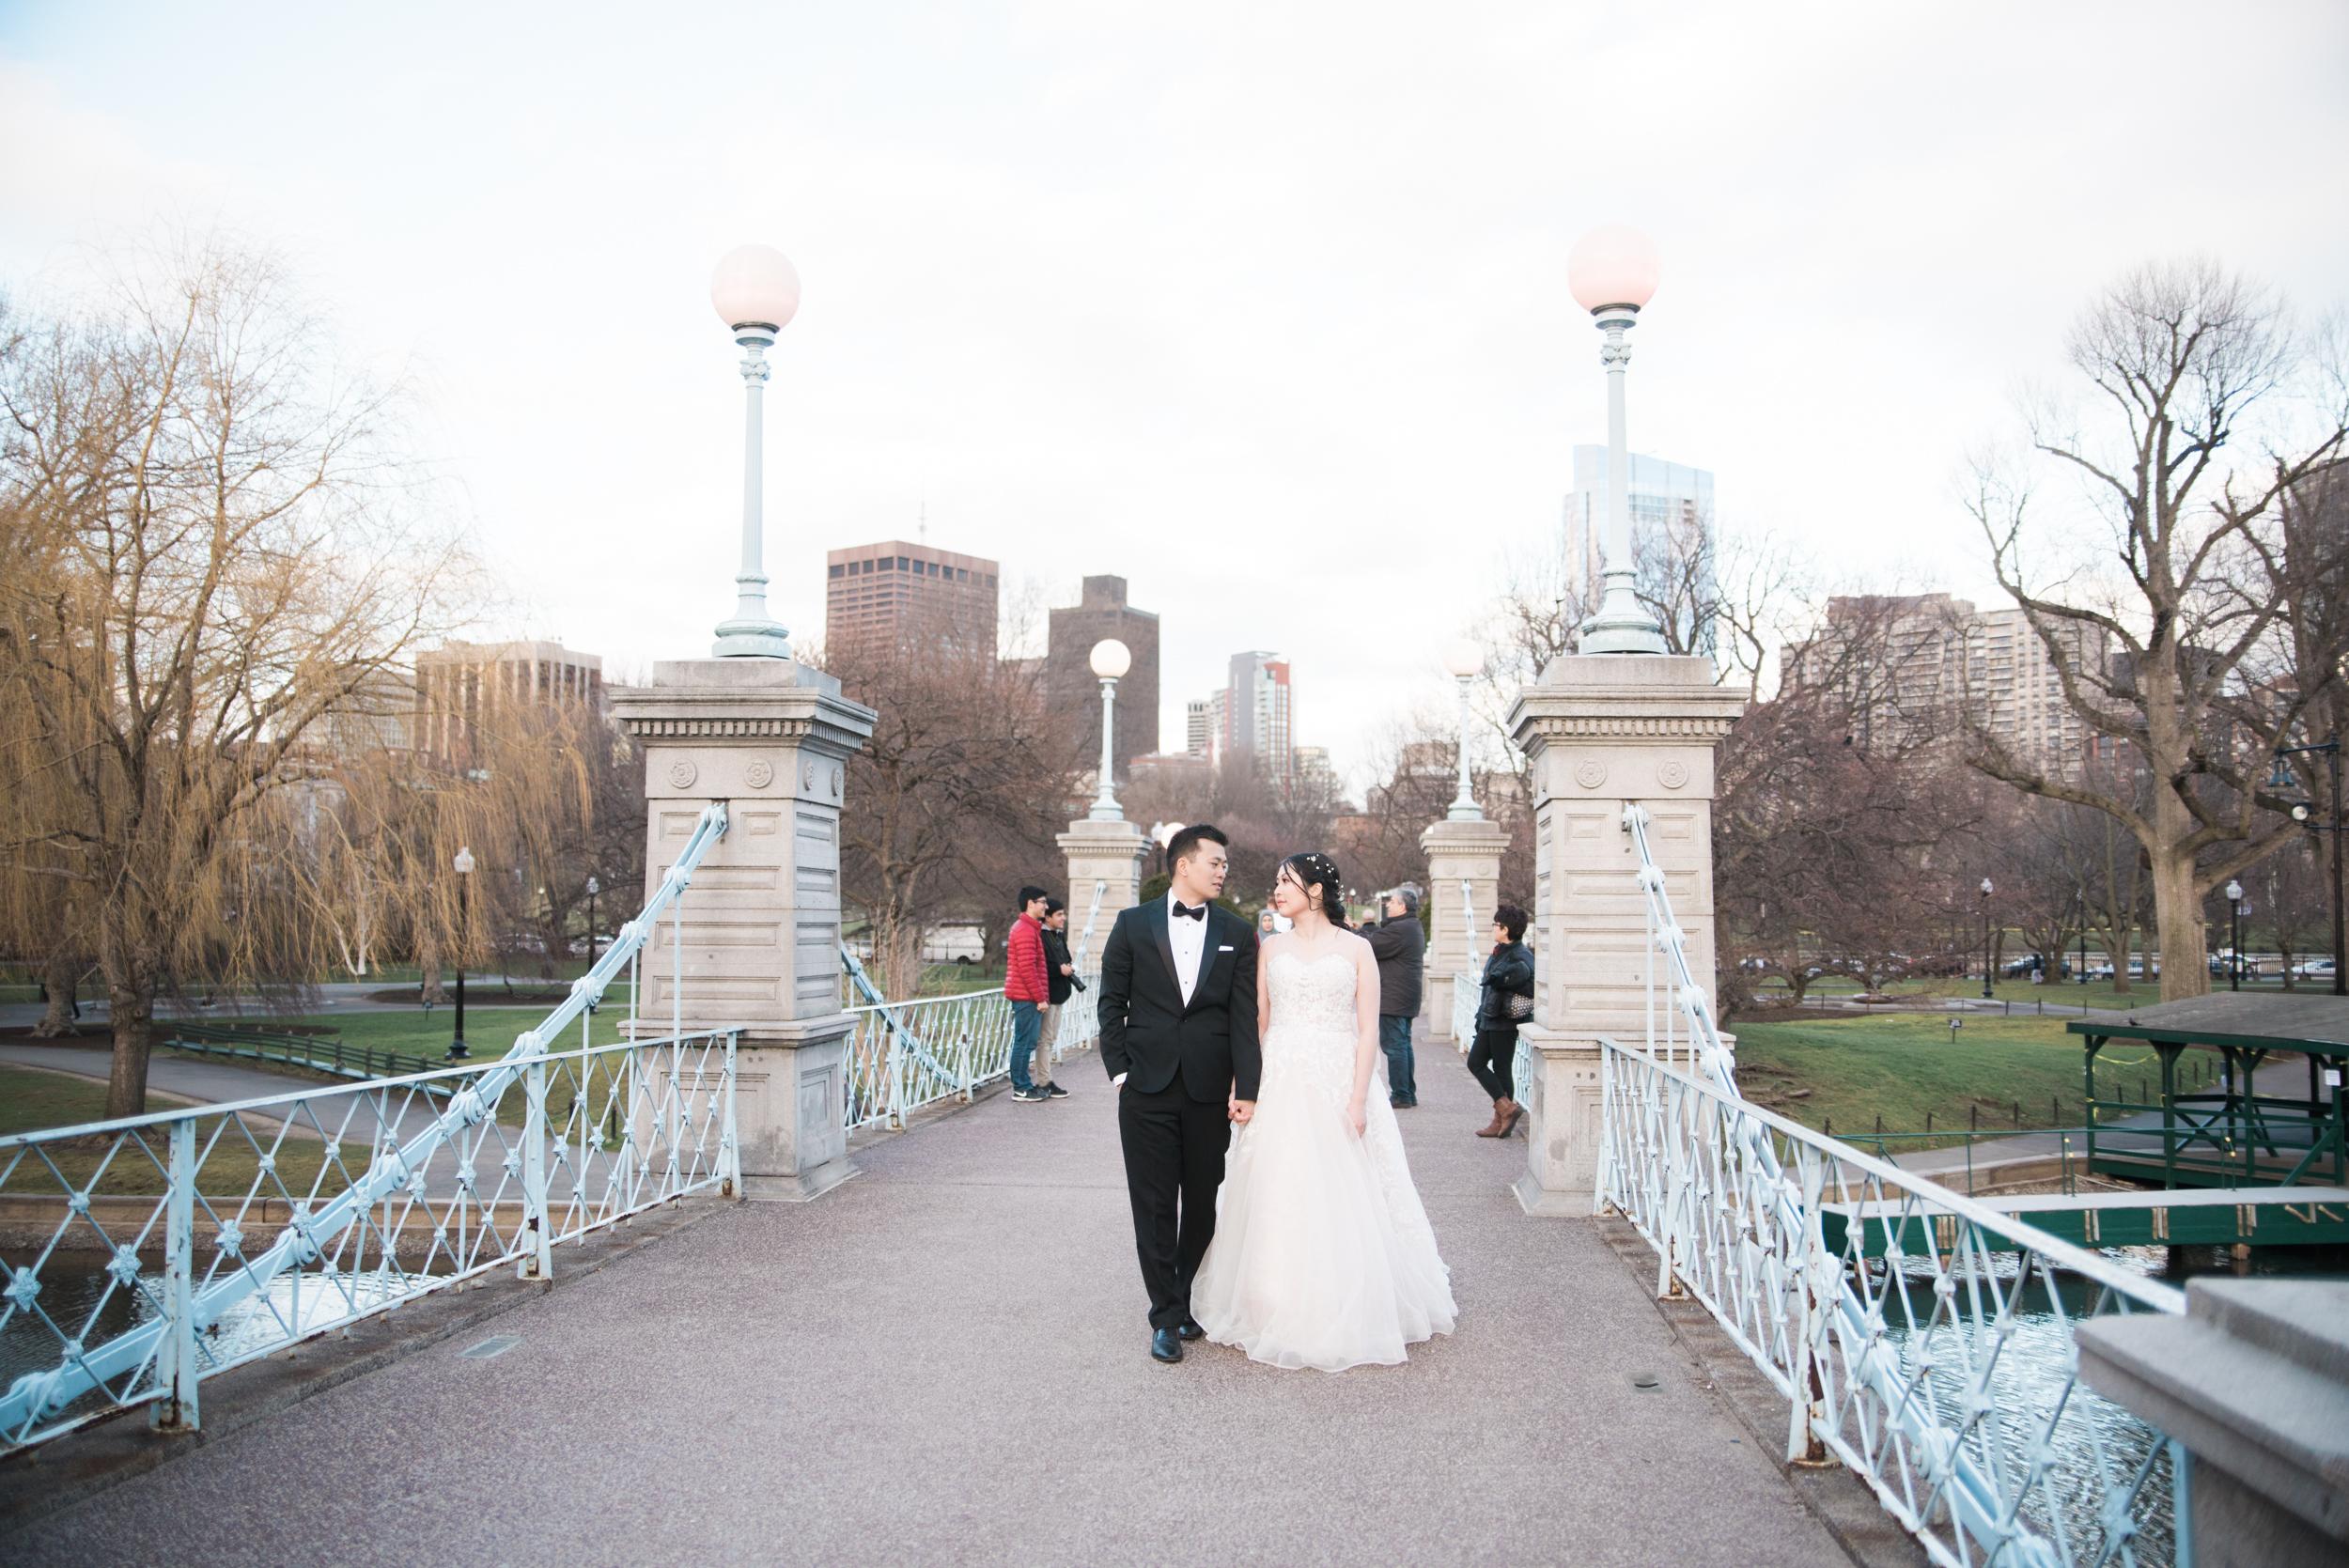 Wedding Photographers that Travel